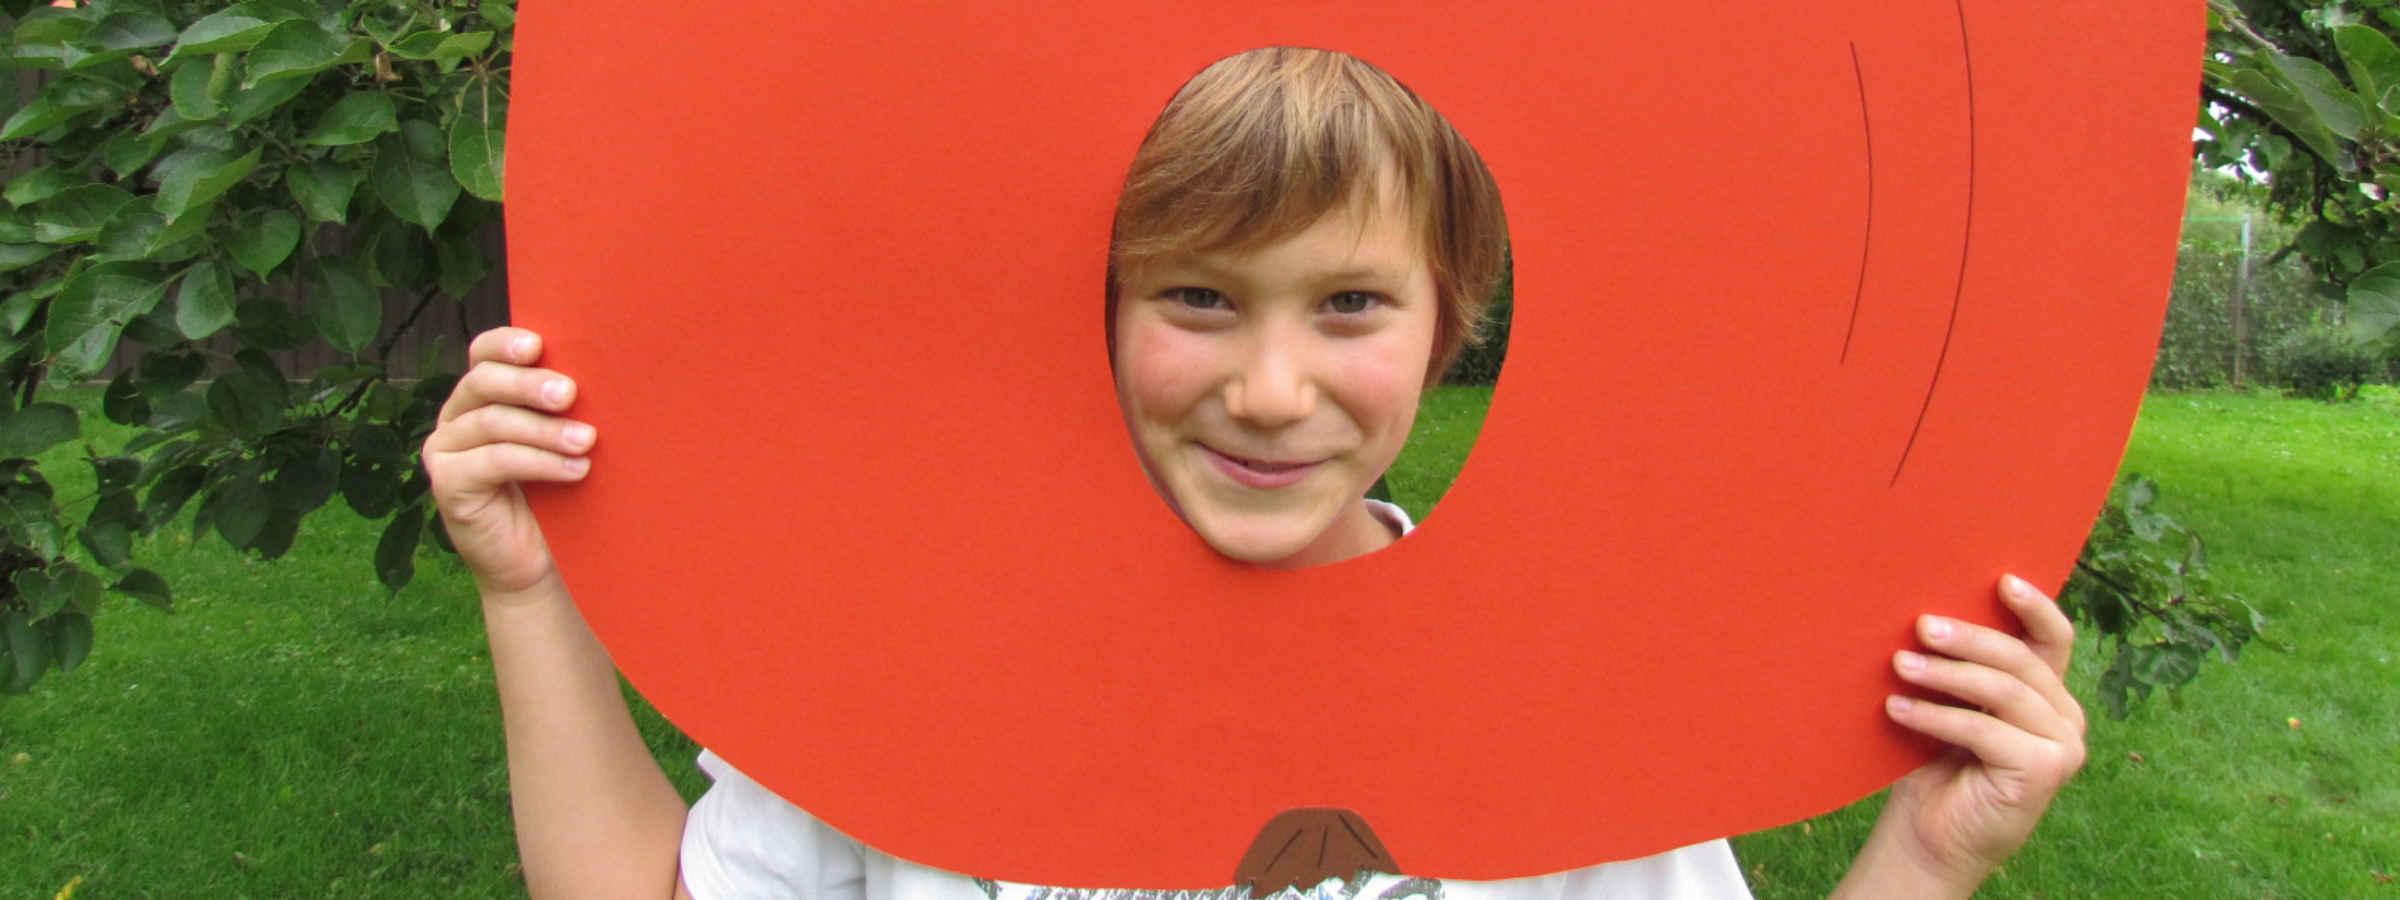 Junge mit gebasteltem Apfel